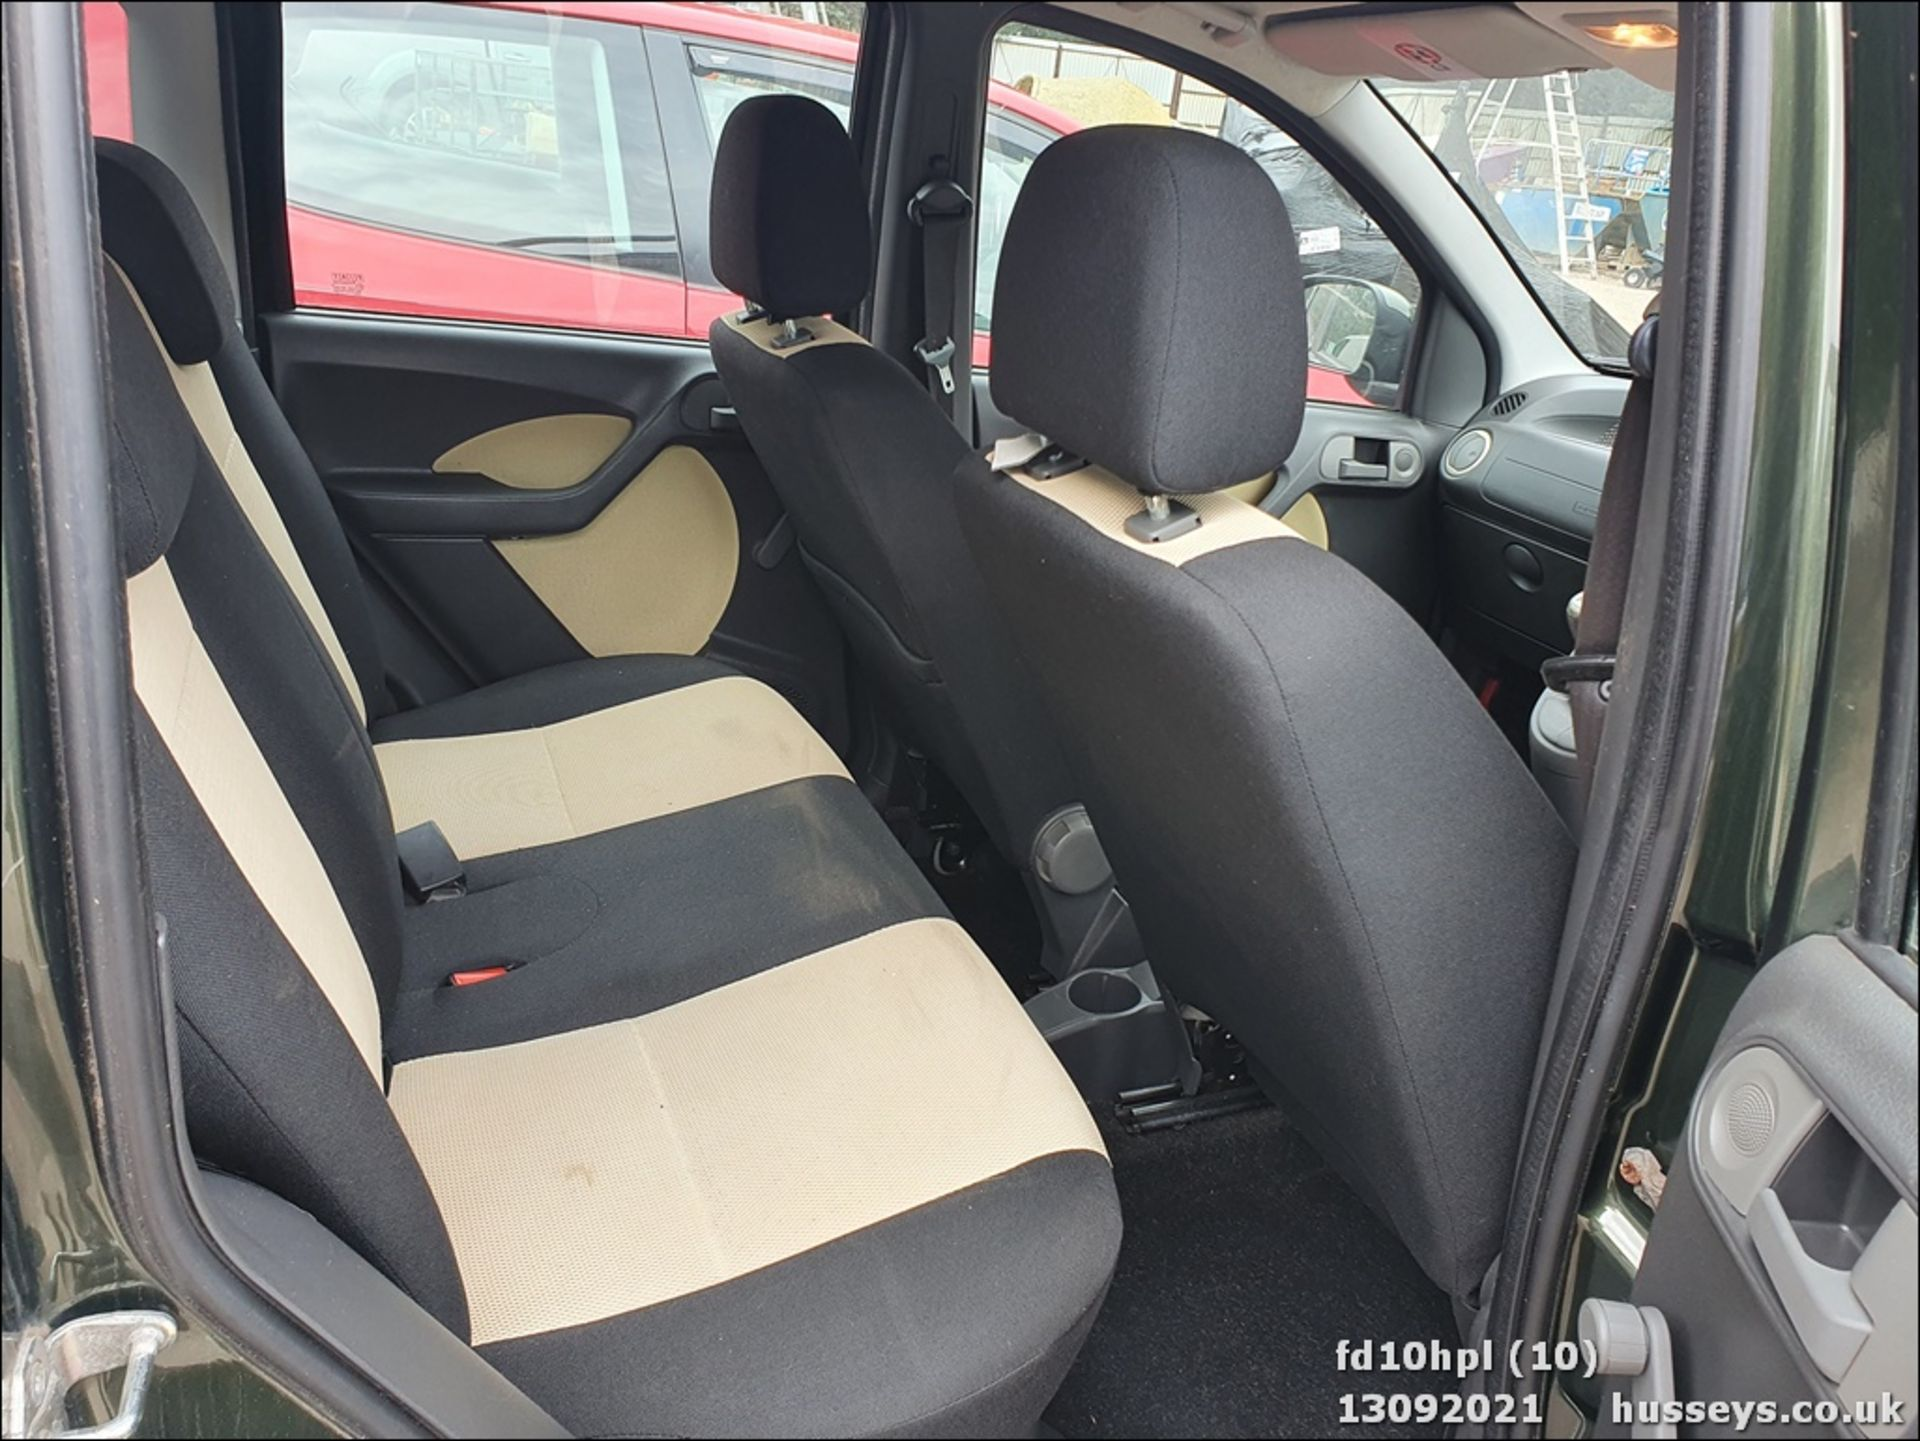 10/10 FIAT PANDA CROSS M-JET 4X4 - 1248cc 5dr Hatchback (Green, 58k) - Image 10 of 15